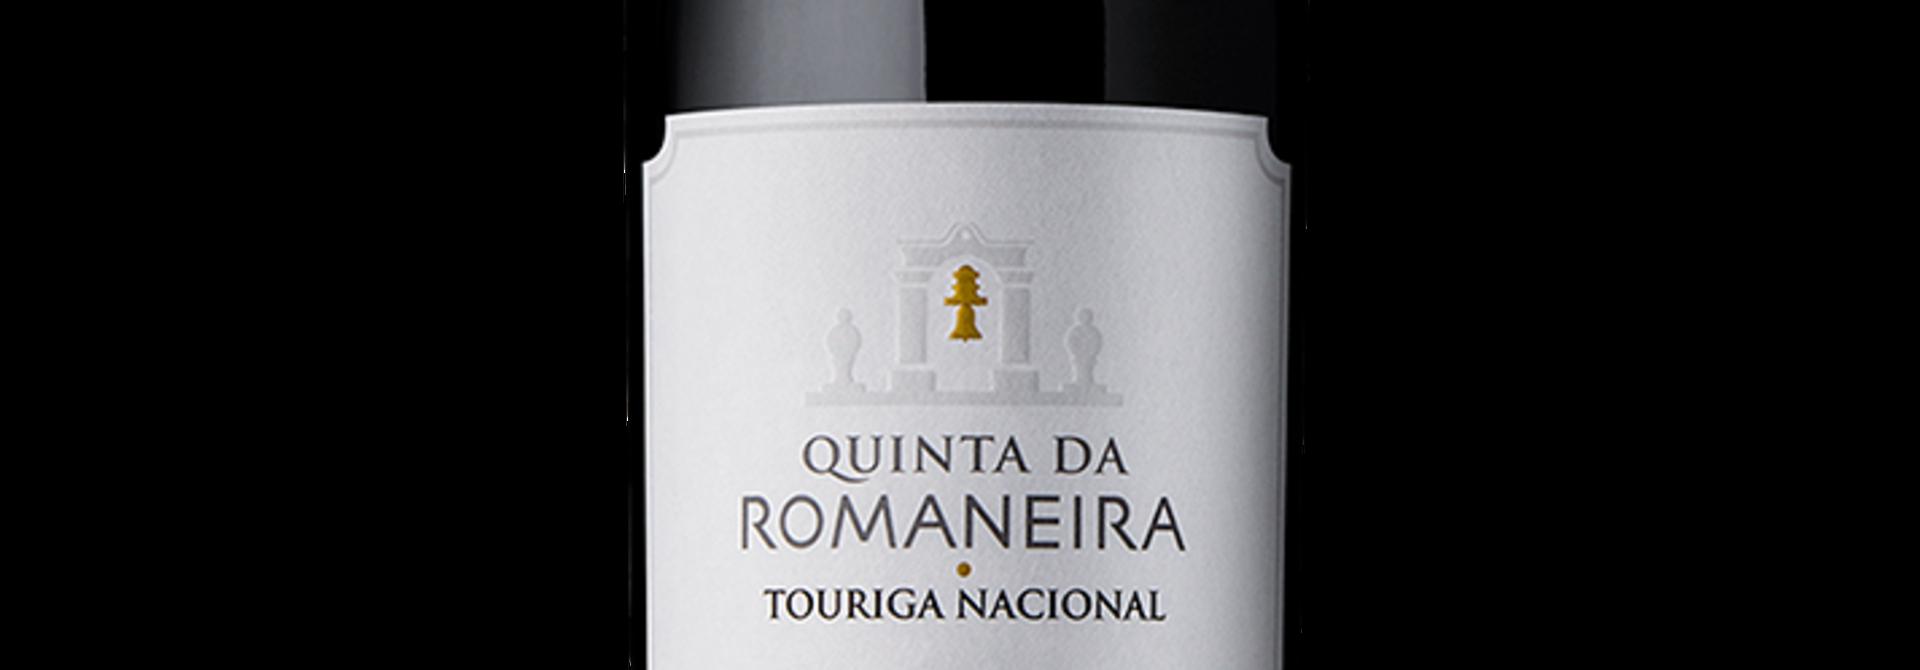 Quinta da Romaneira Touriga Nacional 2015